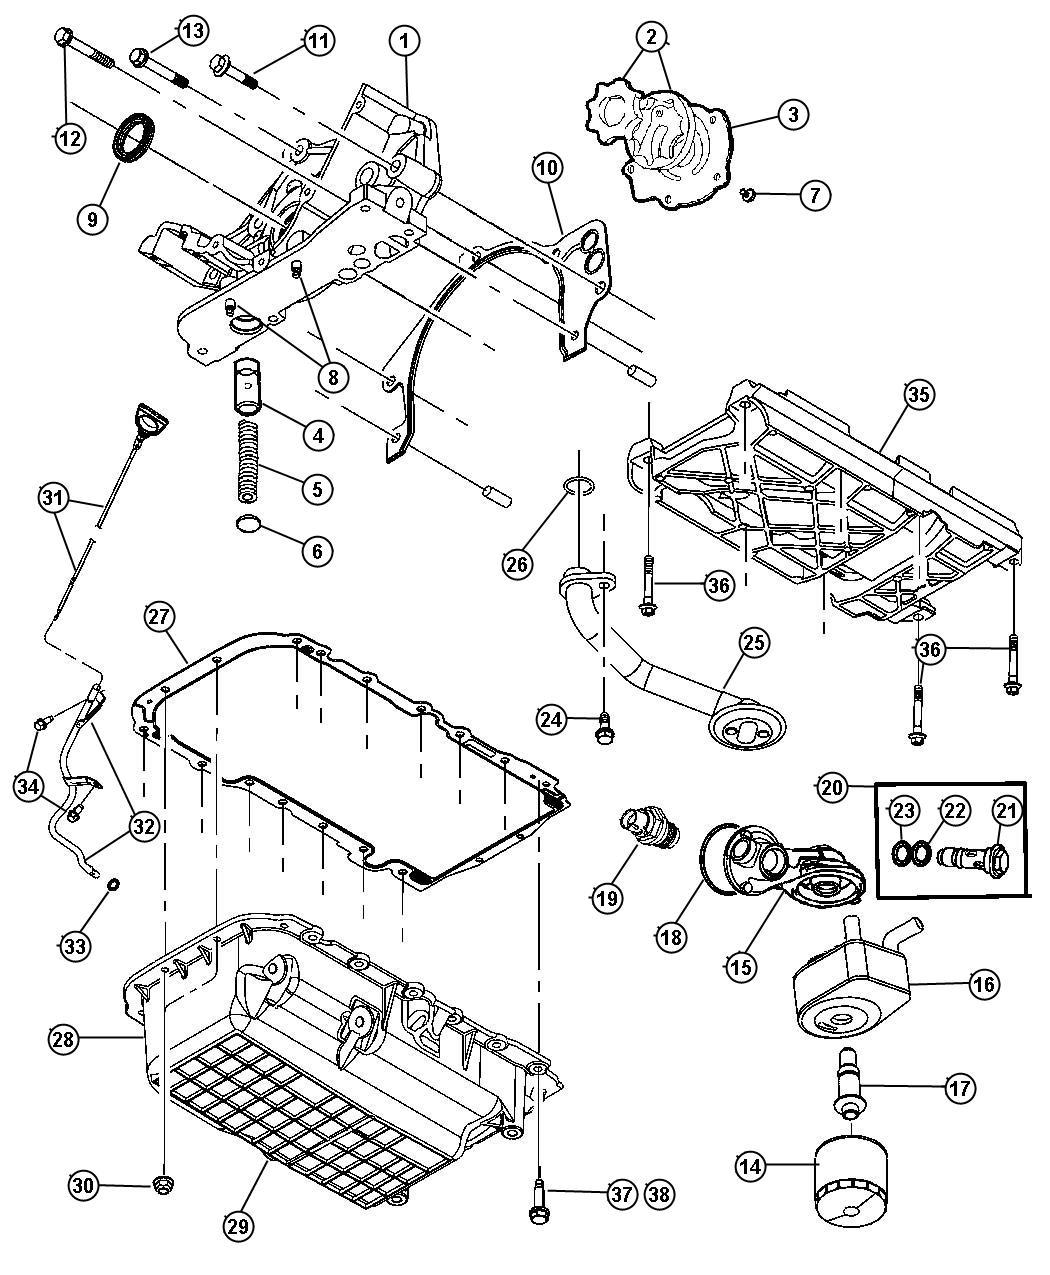 Pathfinder 3 5l Engine Diagram